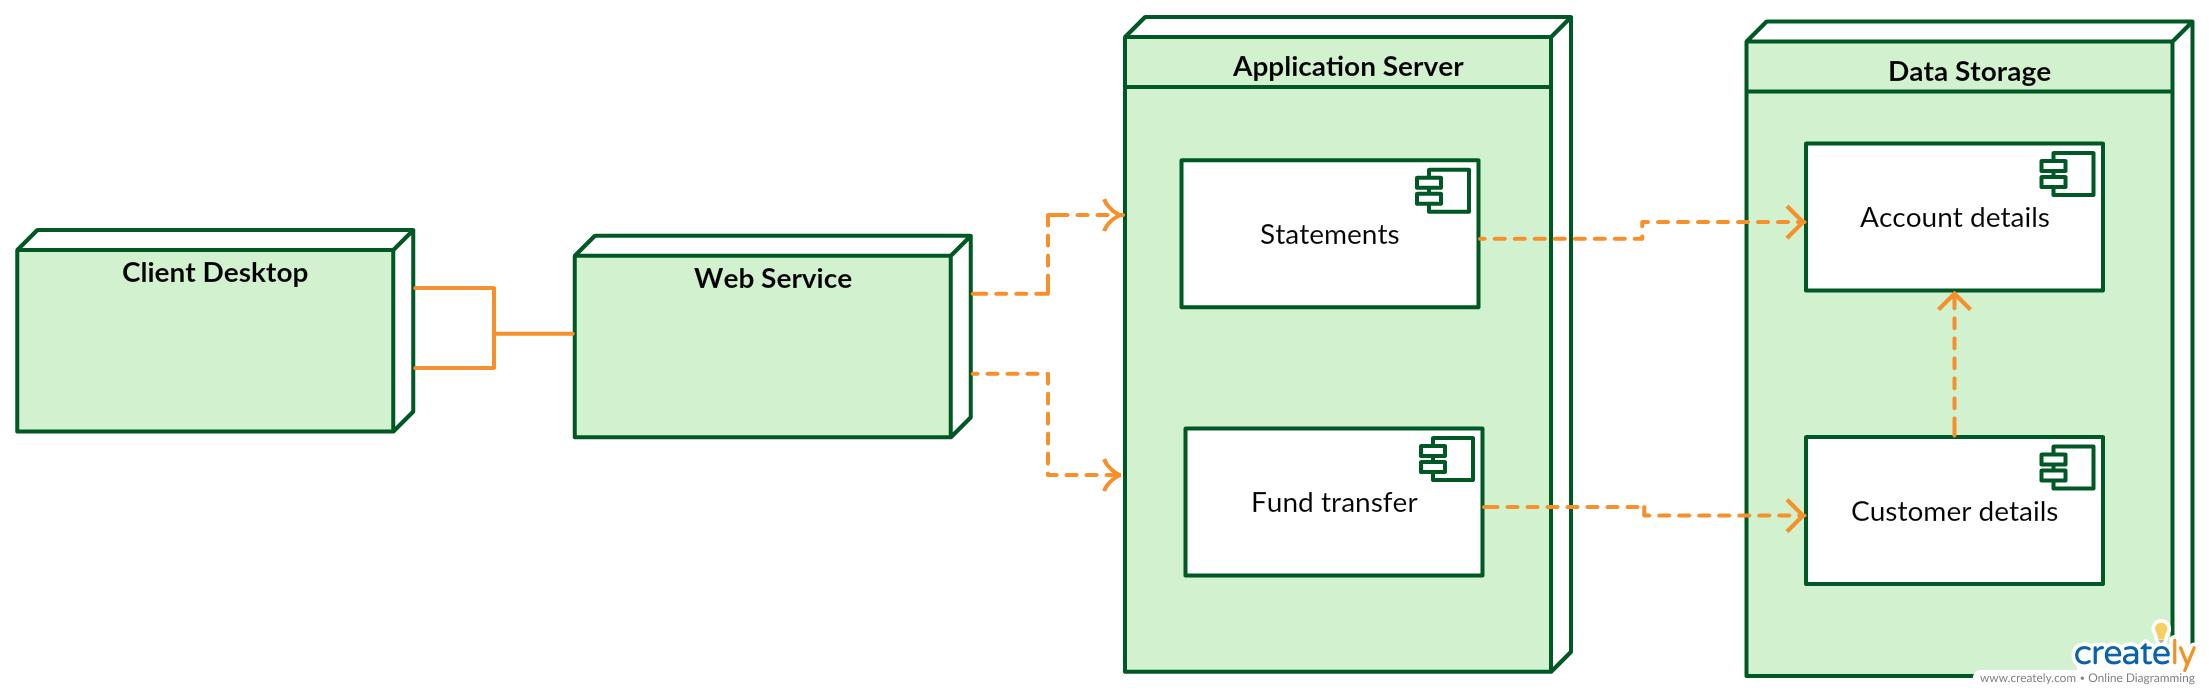 Deployment Diagram for Online Banking Transaction System